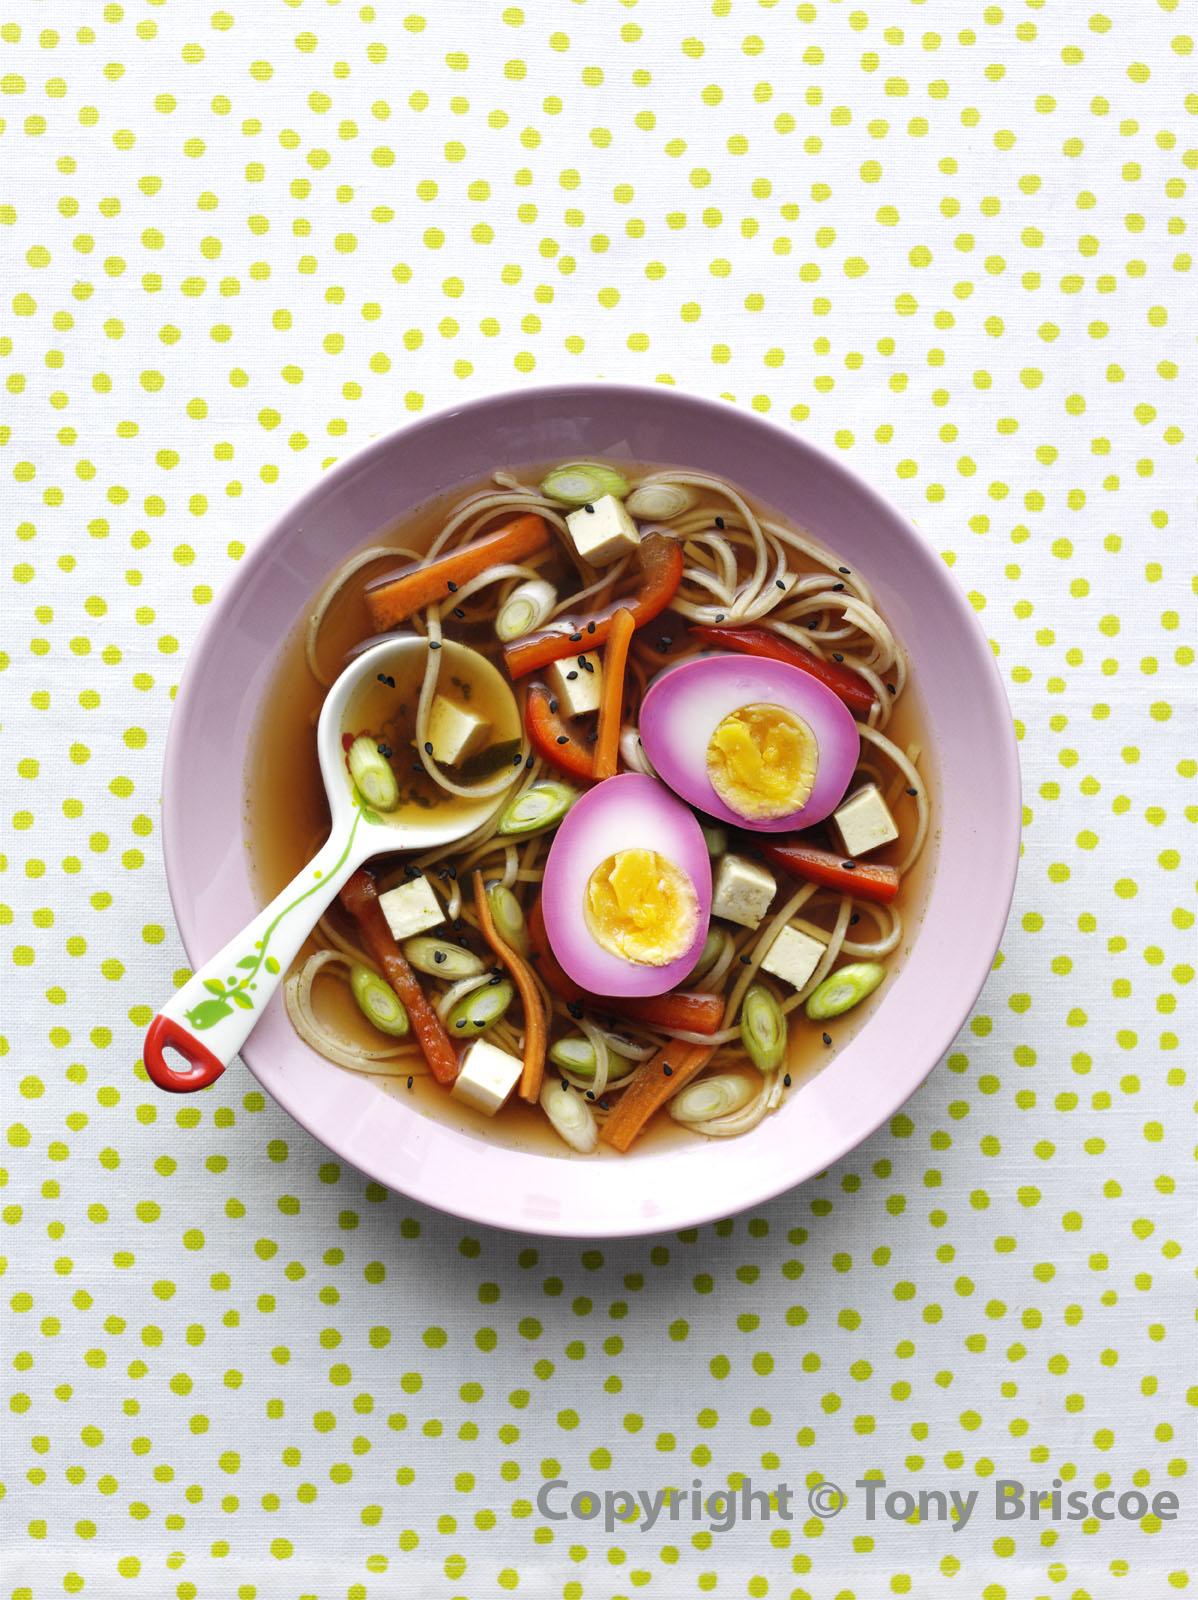 Ramen with pink eggs 2 - watermark